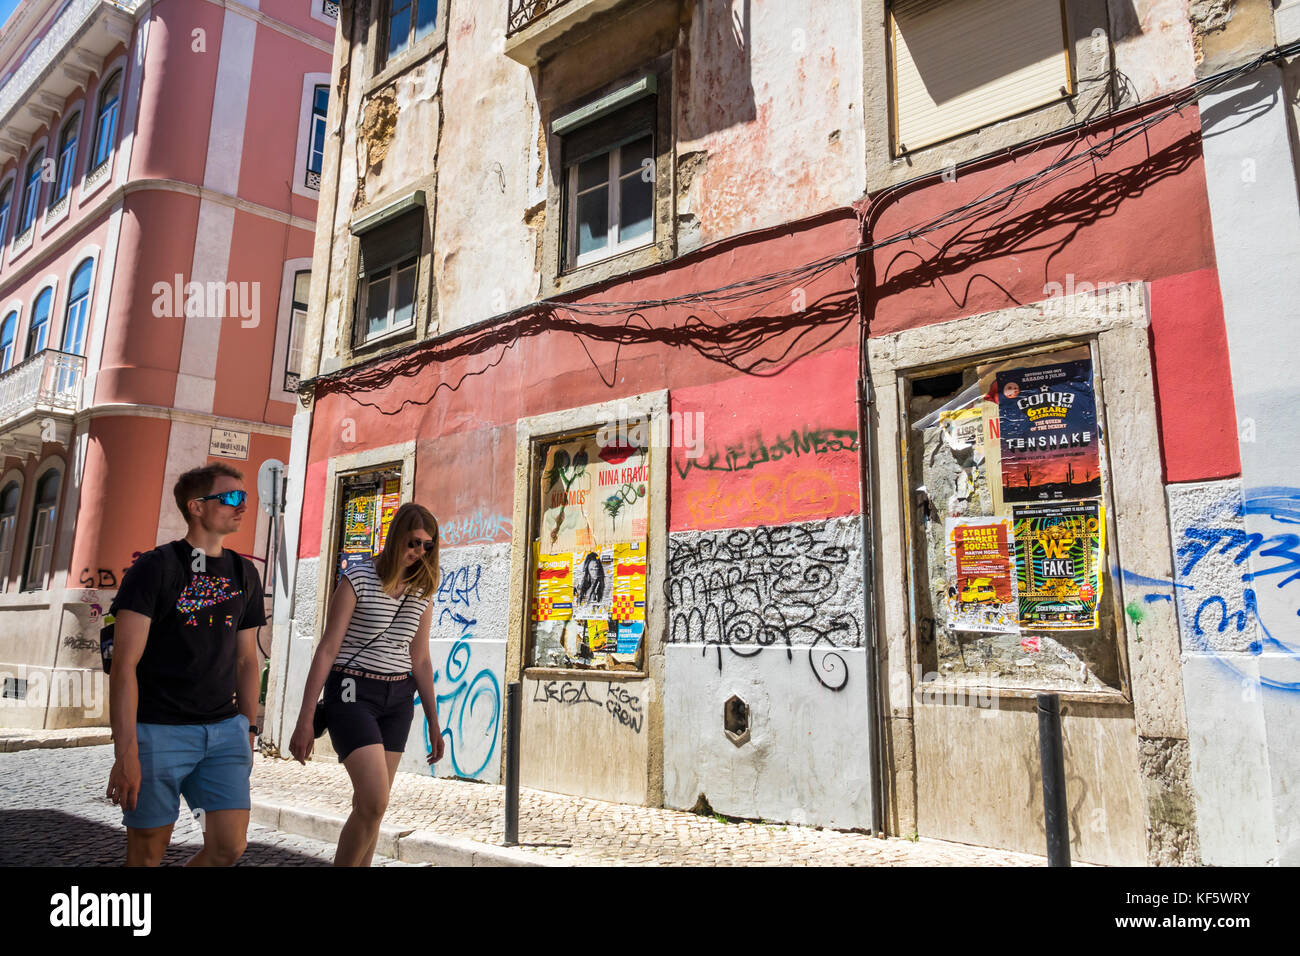 Lisbon Portugal Bairro Alto historic district Principe Real Rua da Rosa neighborhood building dilapidated cobblestone - Stock Image